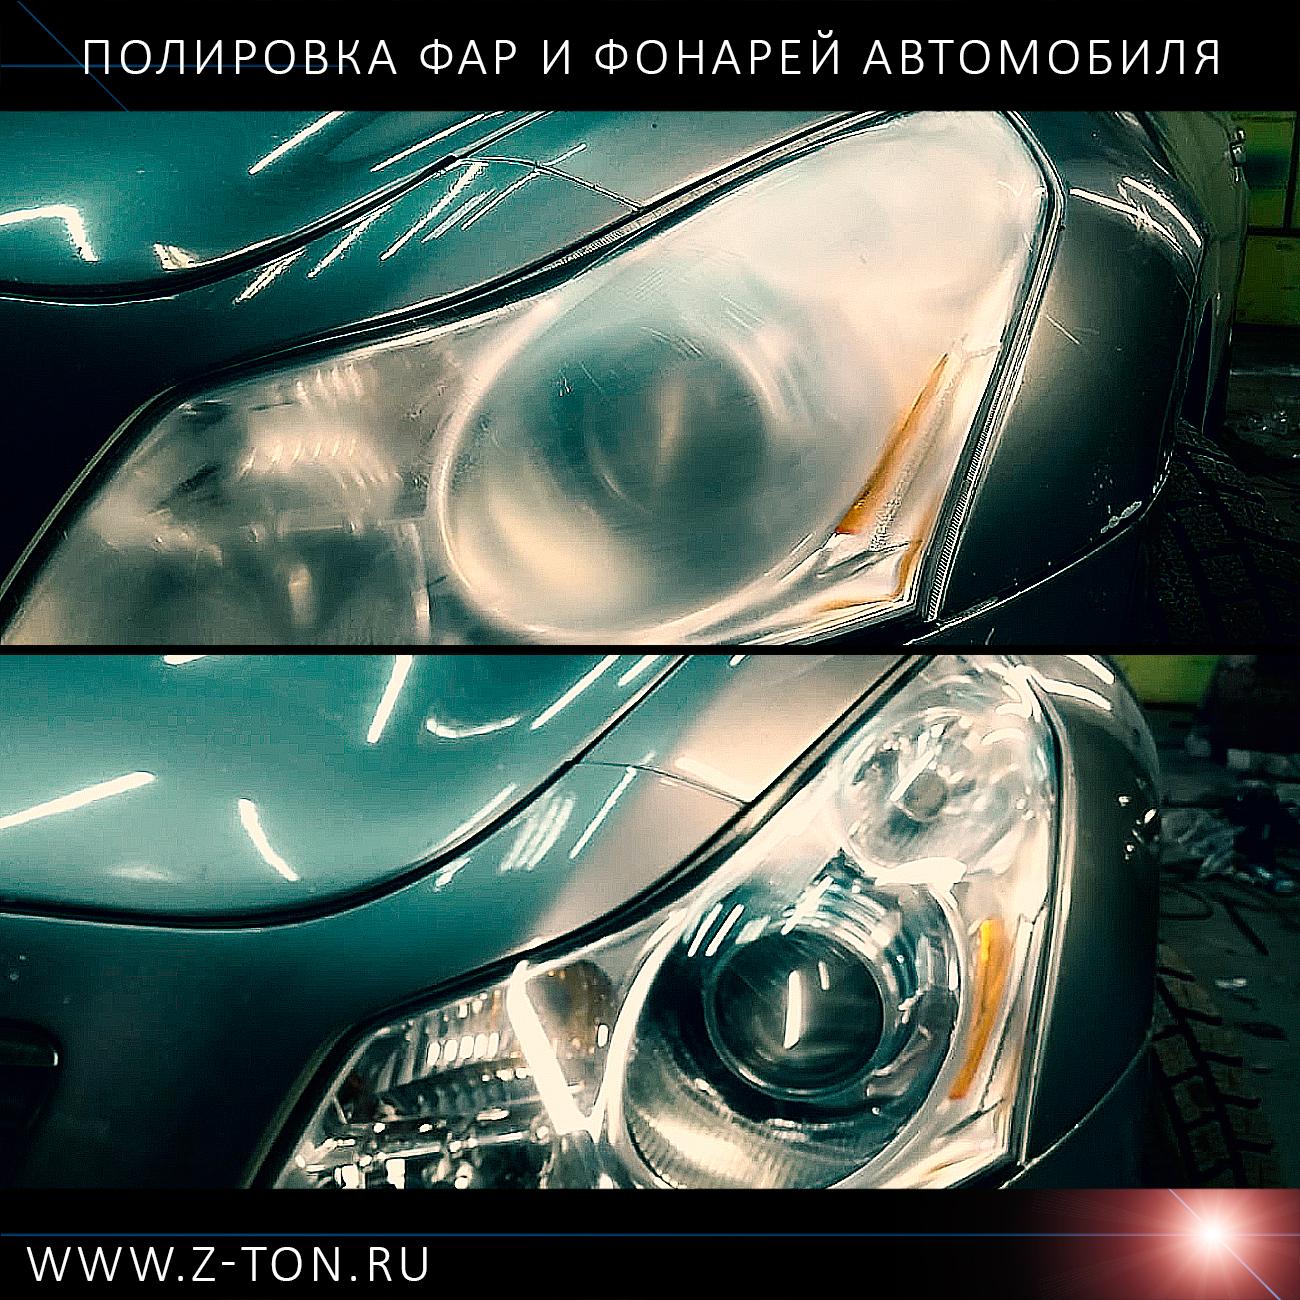 Полировка фар [фонарей] в Зеленограде (Андреевка, Крюково, Москва)